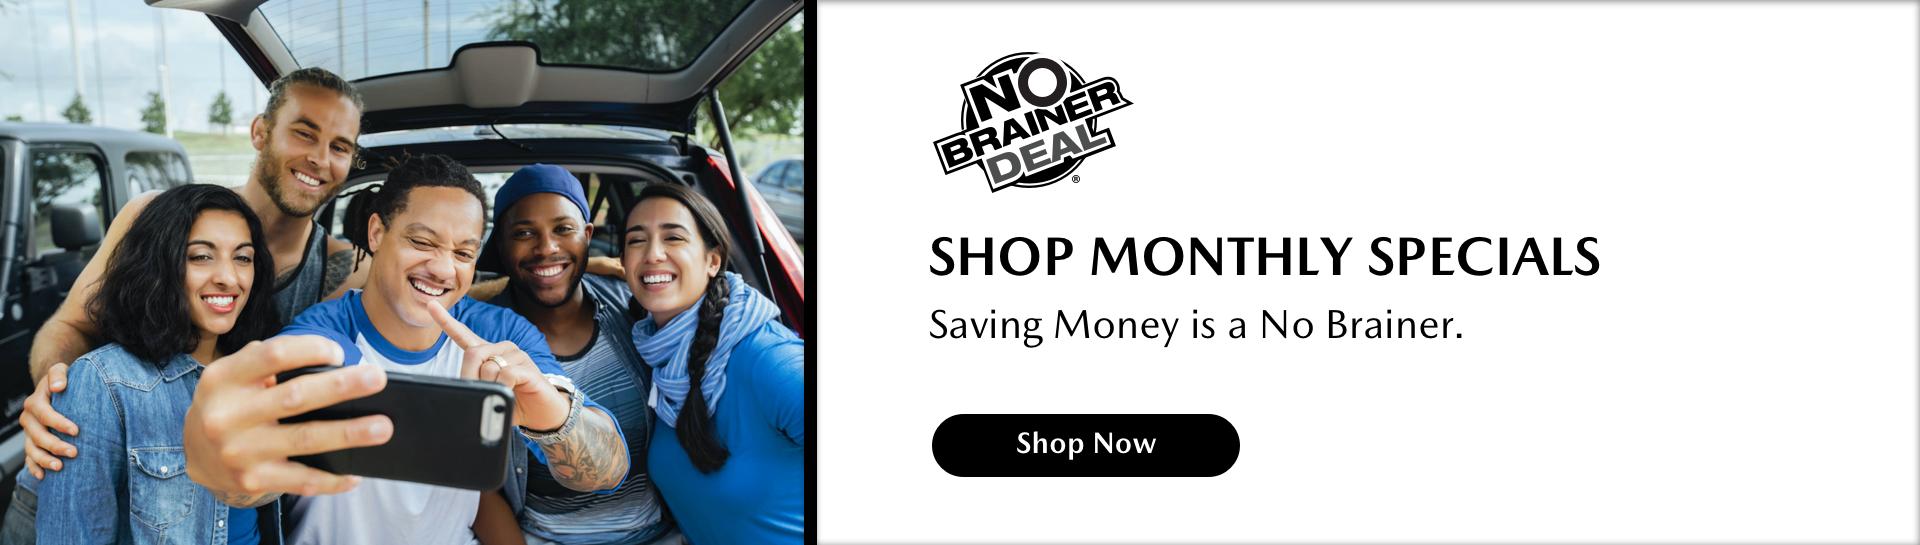 No Brainer Deals 1920×545